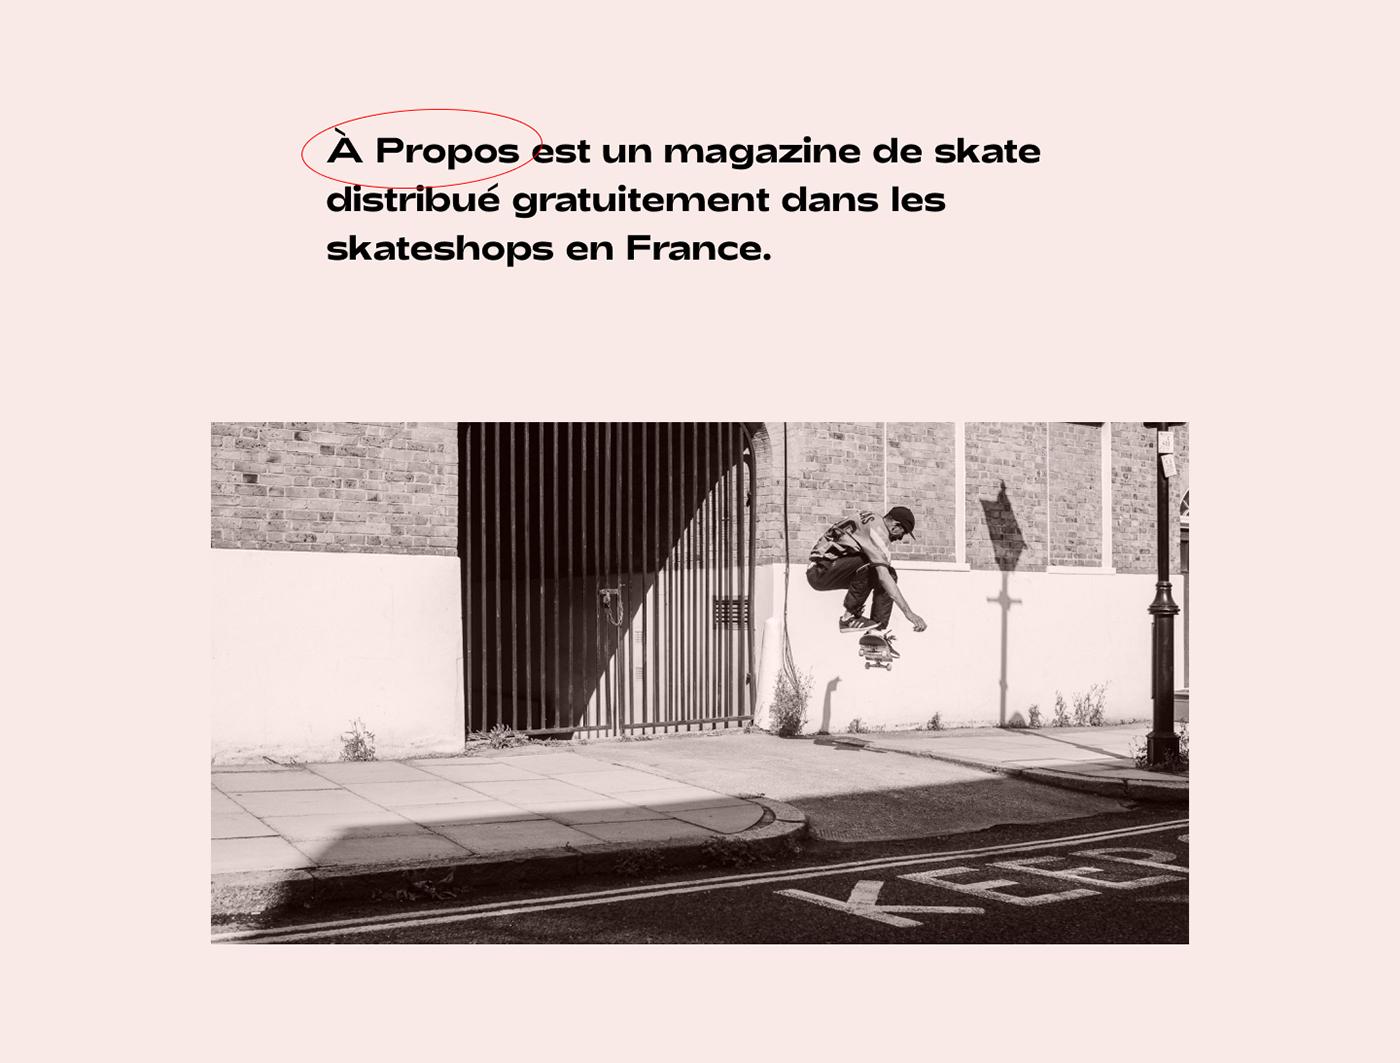 skate skateboard skateshop apropos Propos magazine mag